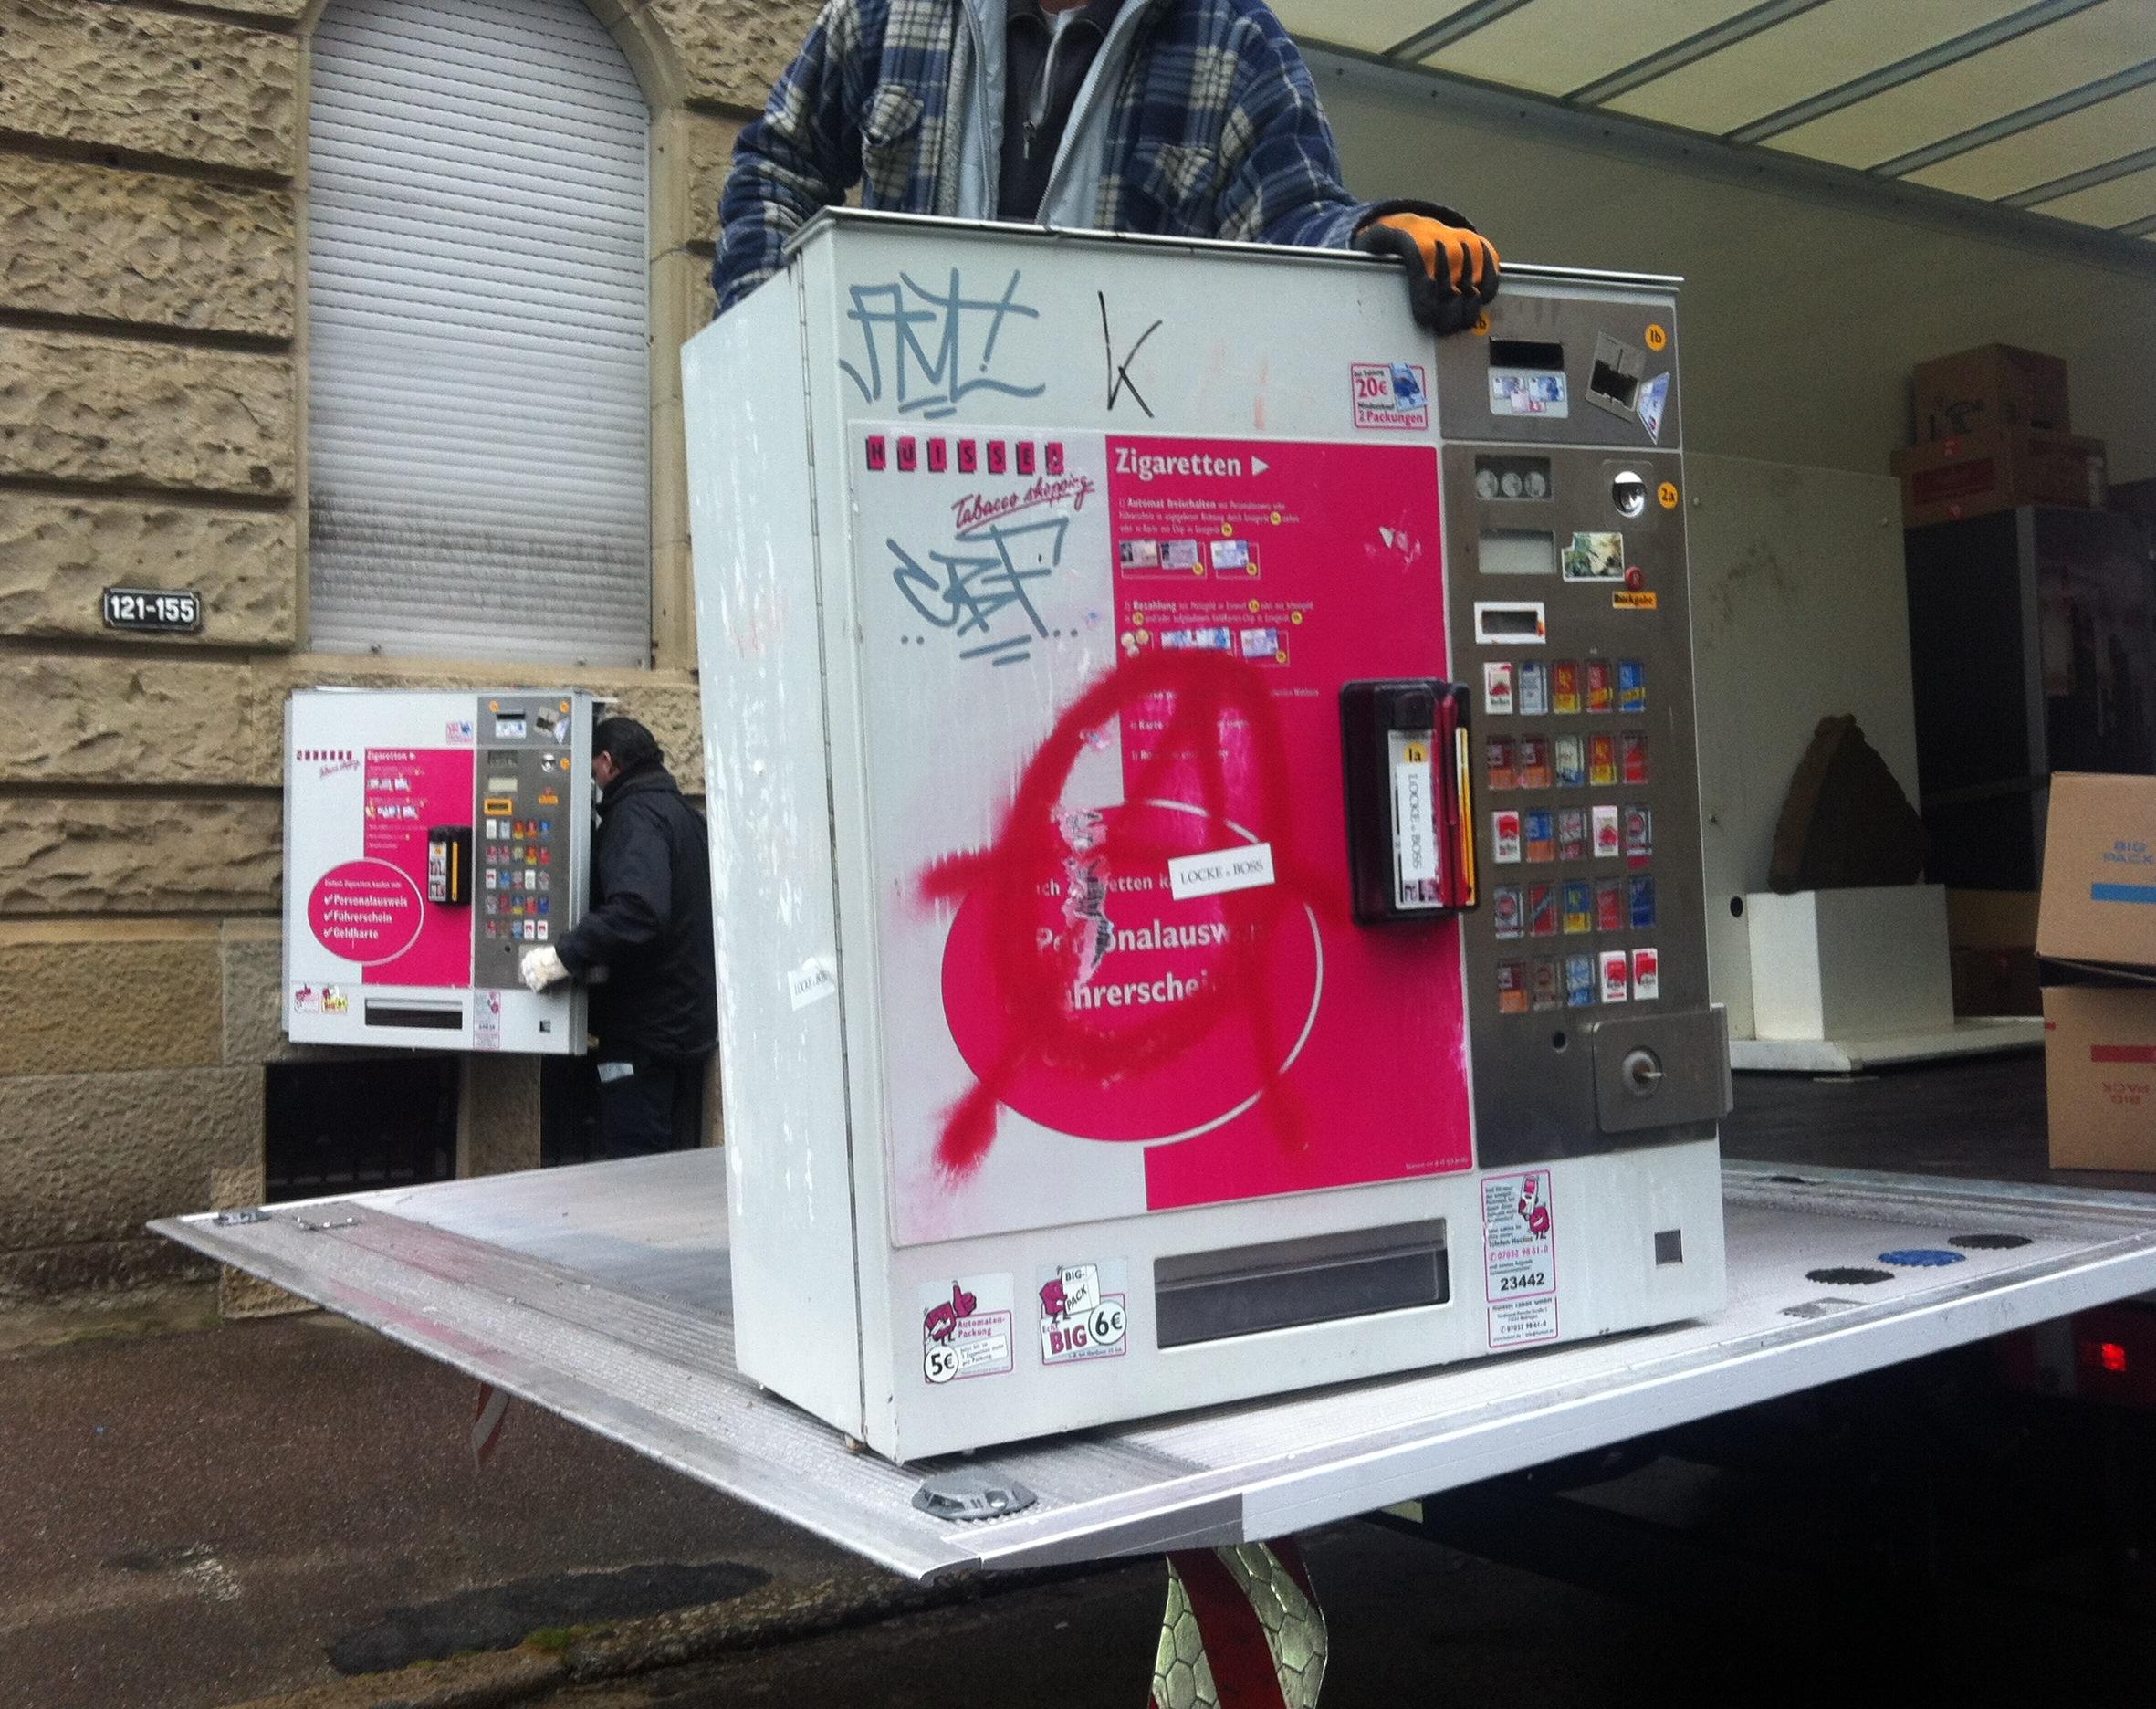 Zigarettenautomat gestohlen